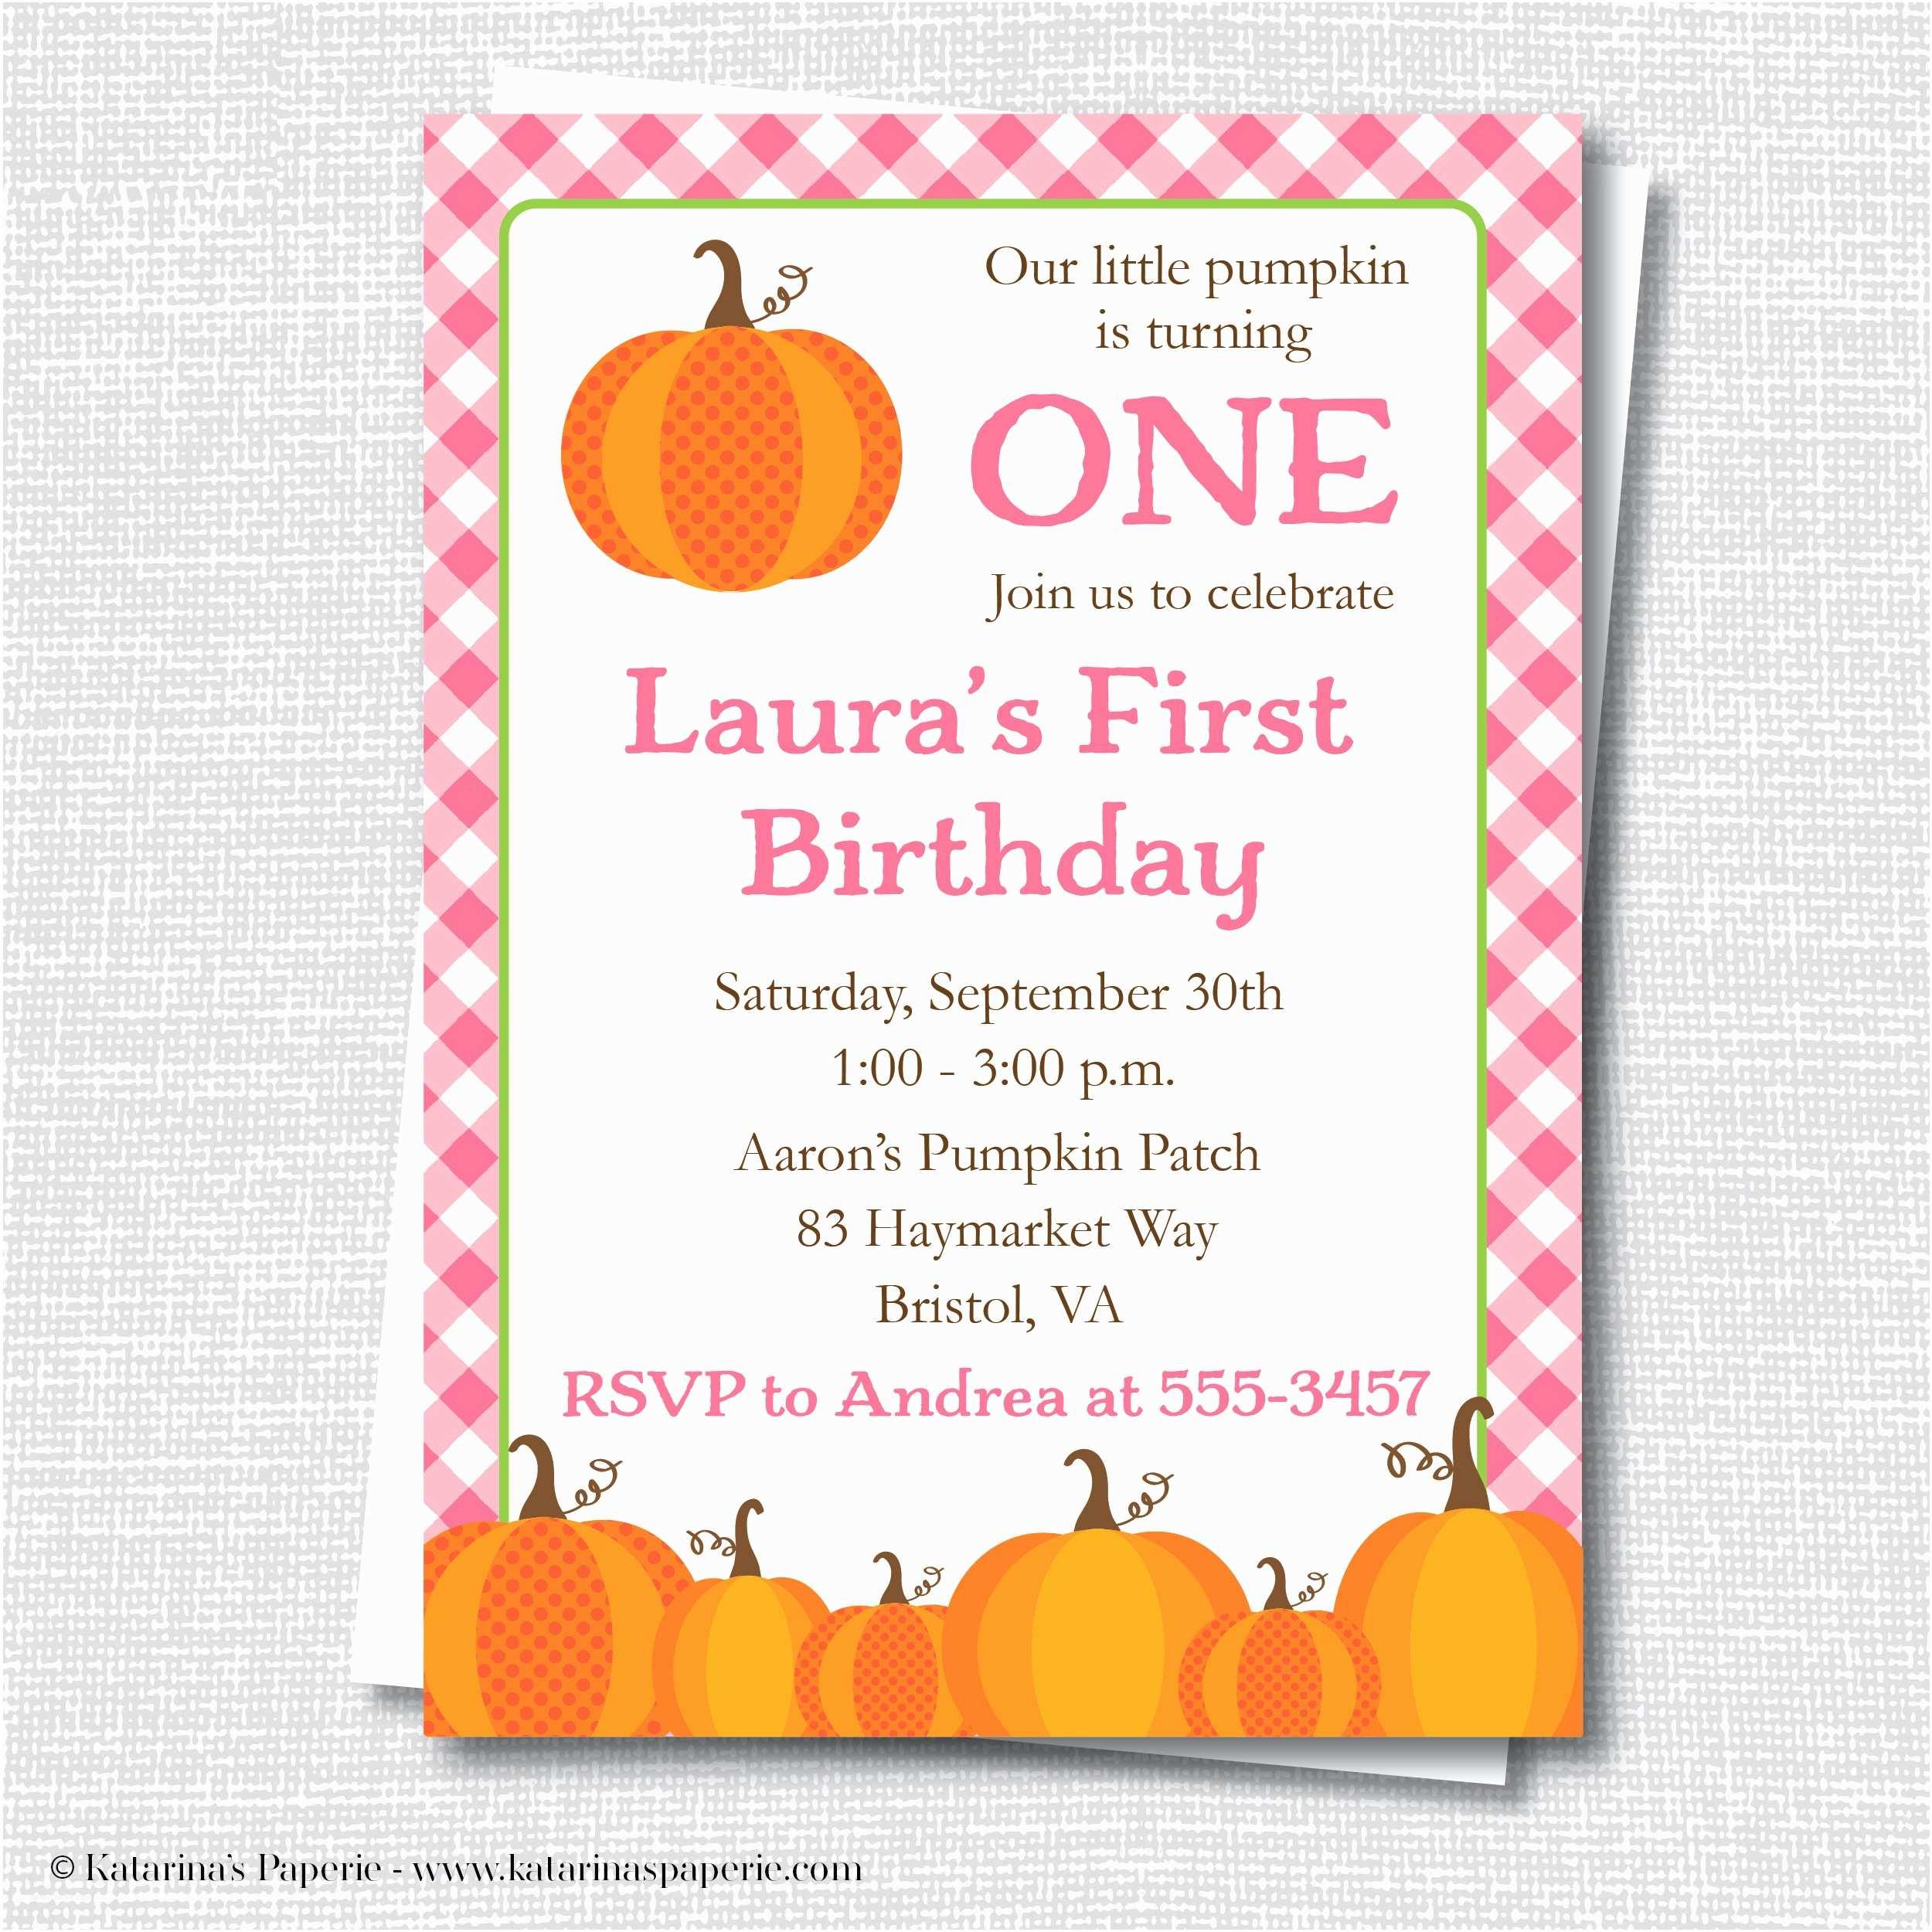 Pumpkin Birthday Invitations Pink Pumpkin Birthday Party Invitation Katarina S Paperie